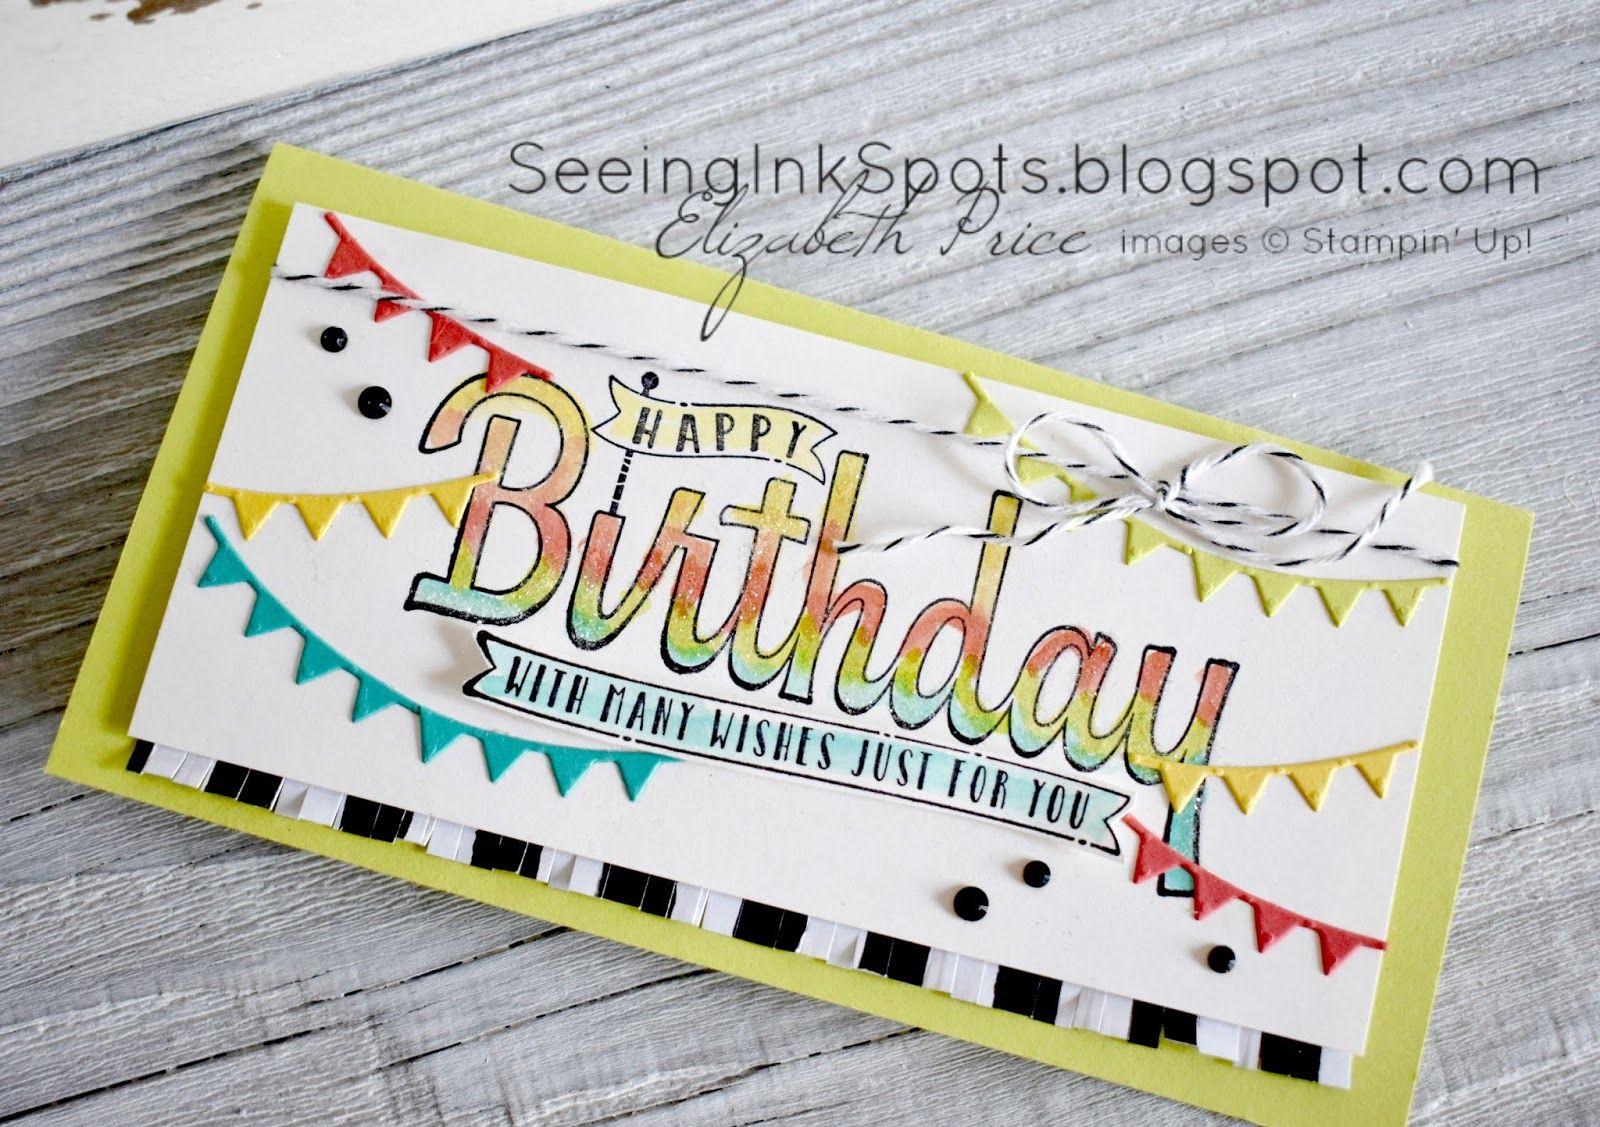 A New Happy Birthday | Pinterest | Handmade greetings, Scrapbooking ...